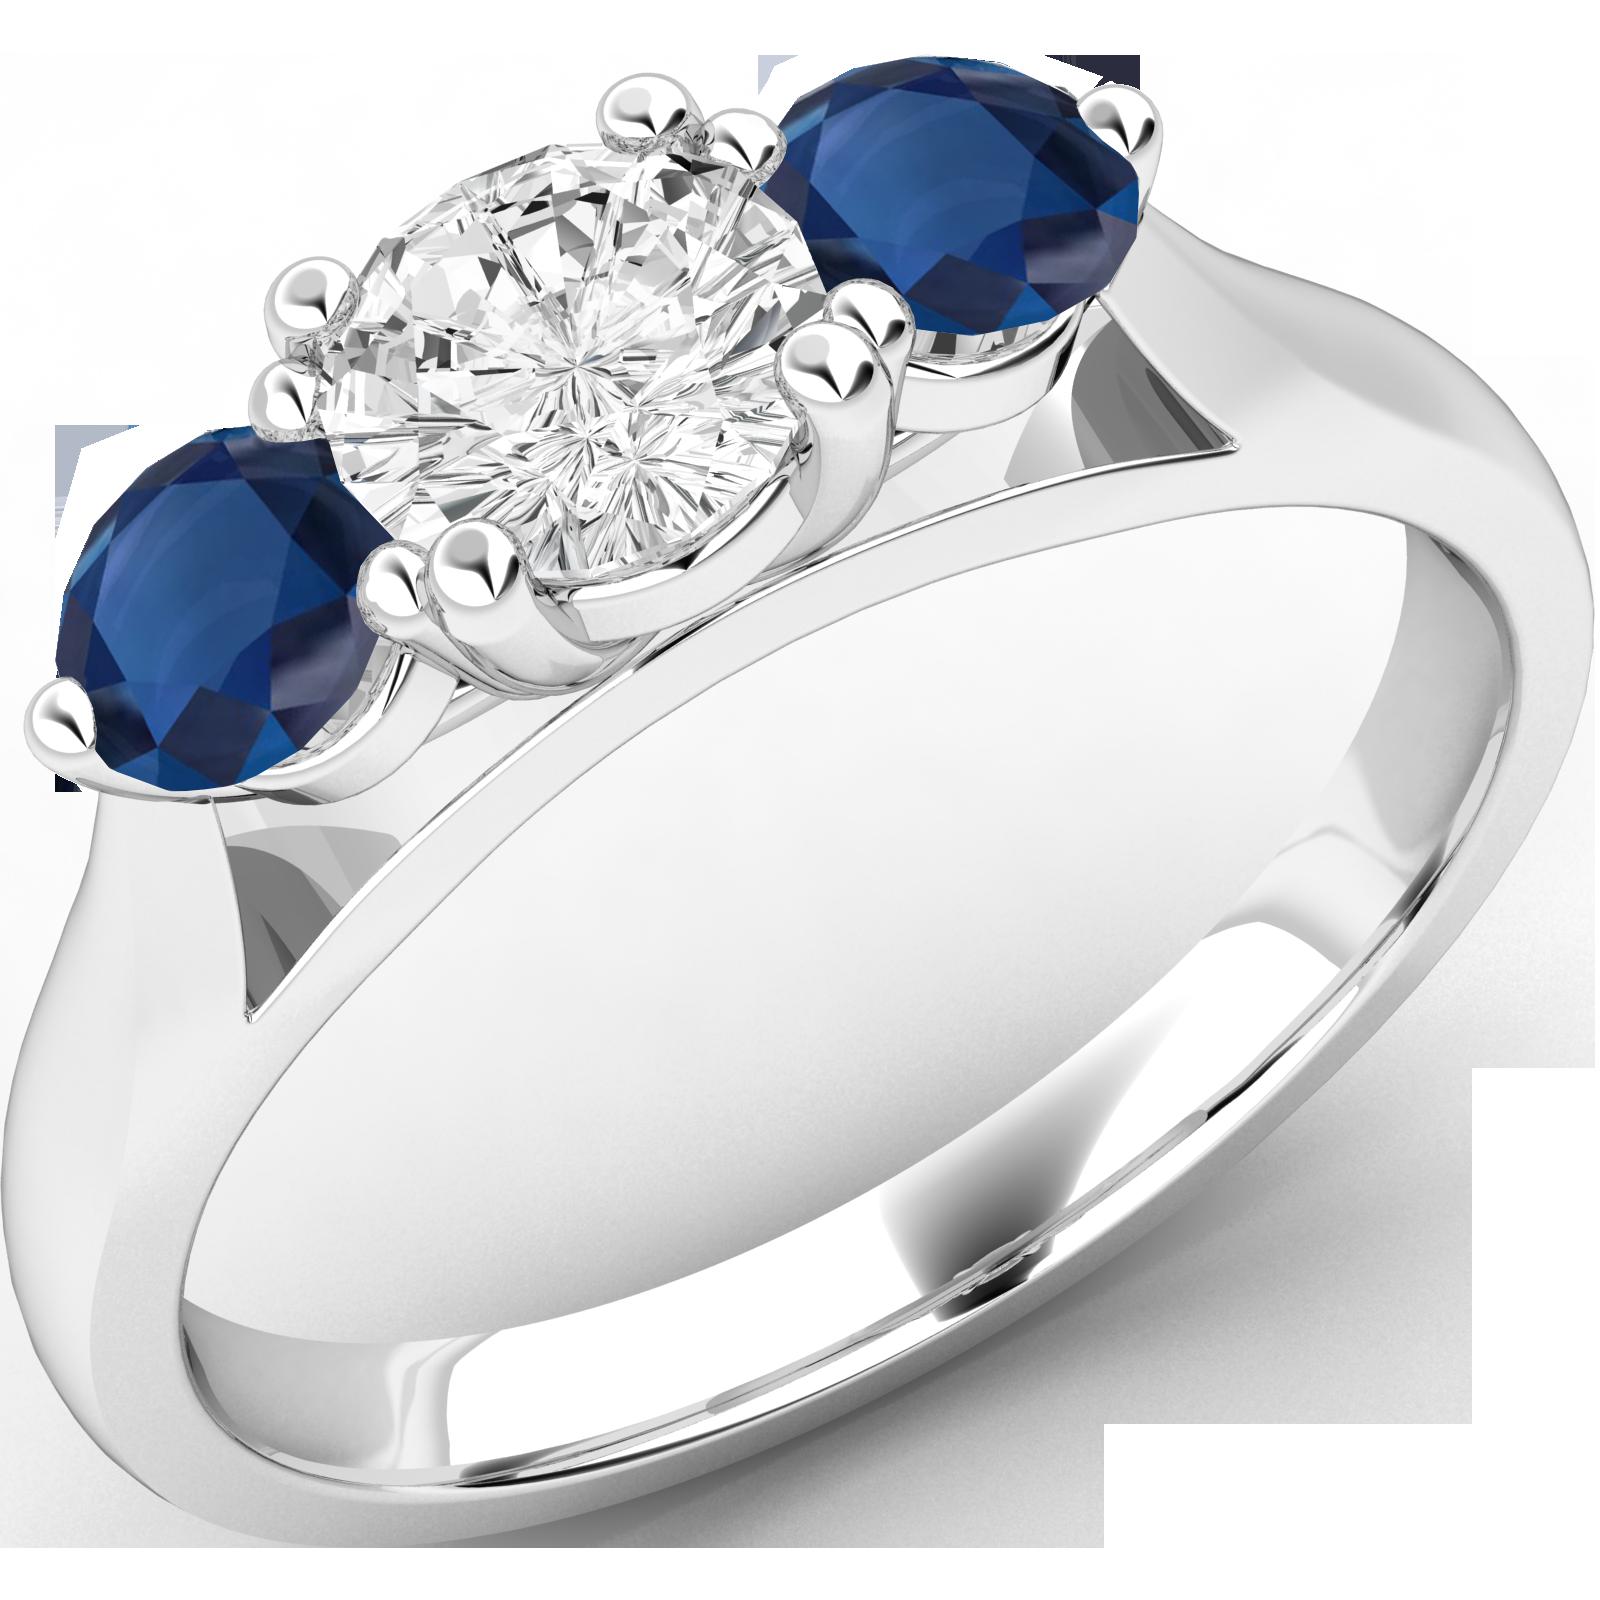 RDSS491W-Inel cu Diamant si Safir Dama Aur Alb 18kt cu un Diamant si 2 Safire Rotund Briliant in Setare Gheare,Stil Clasic-img1